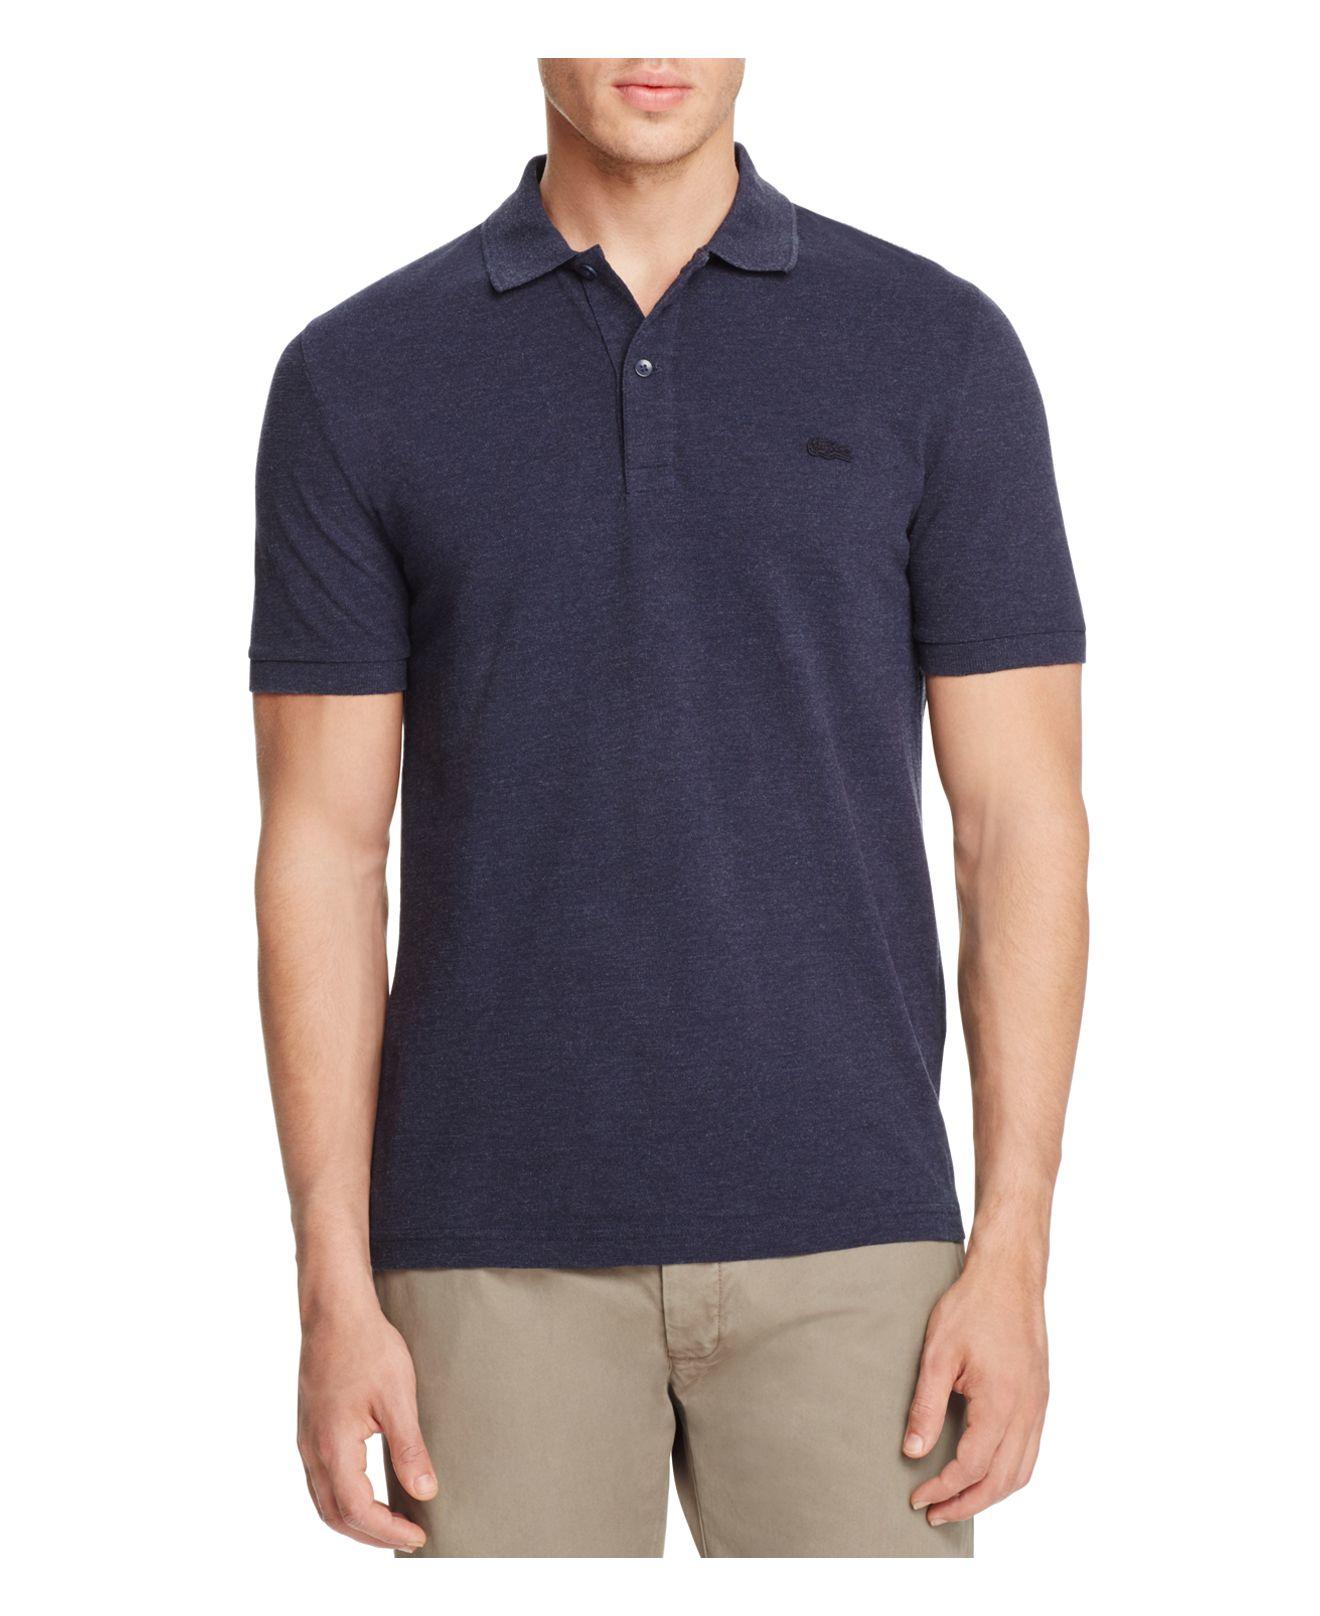 lacoste garment dyed slub knit slim fit polo shirt in blue. Black Bedroom Furniture Sets. Home Design Ideas